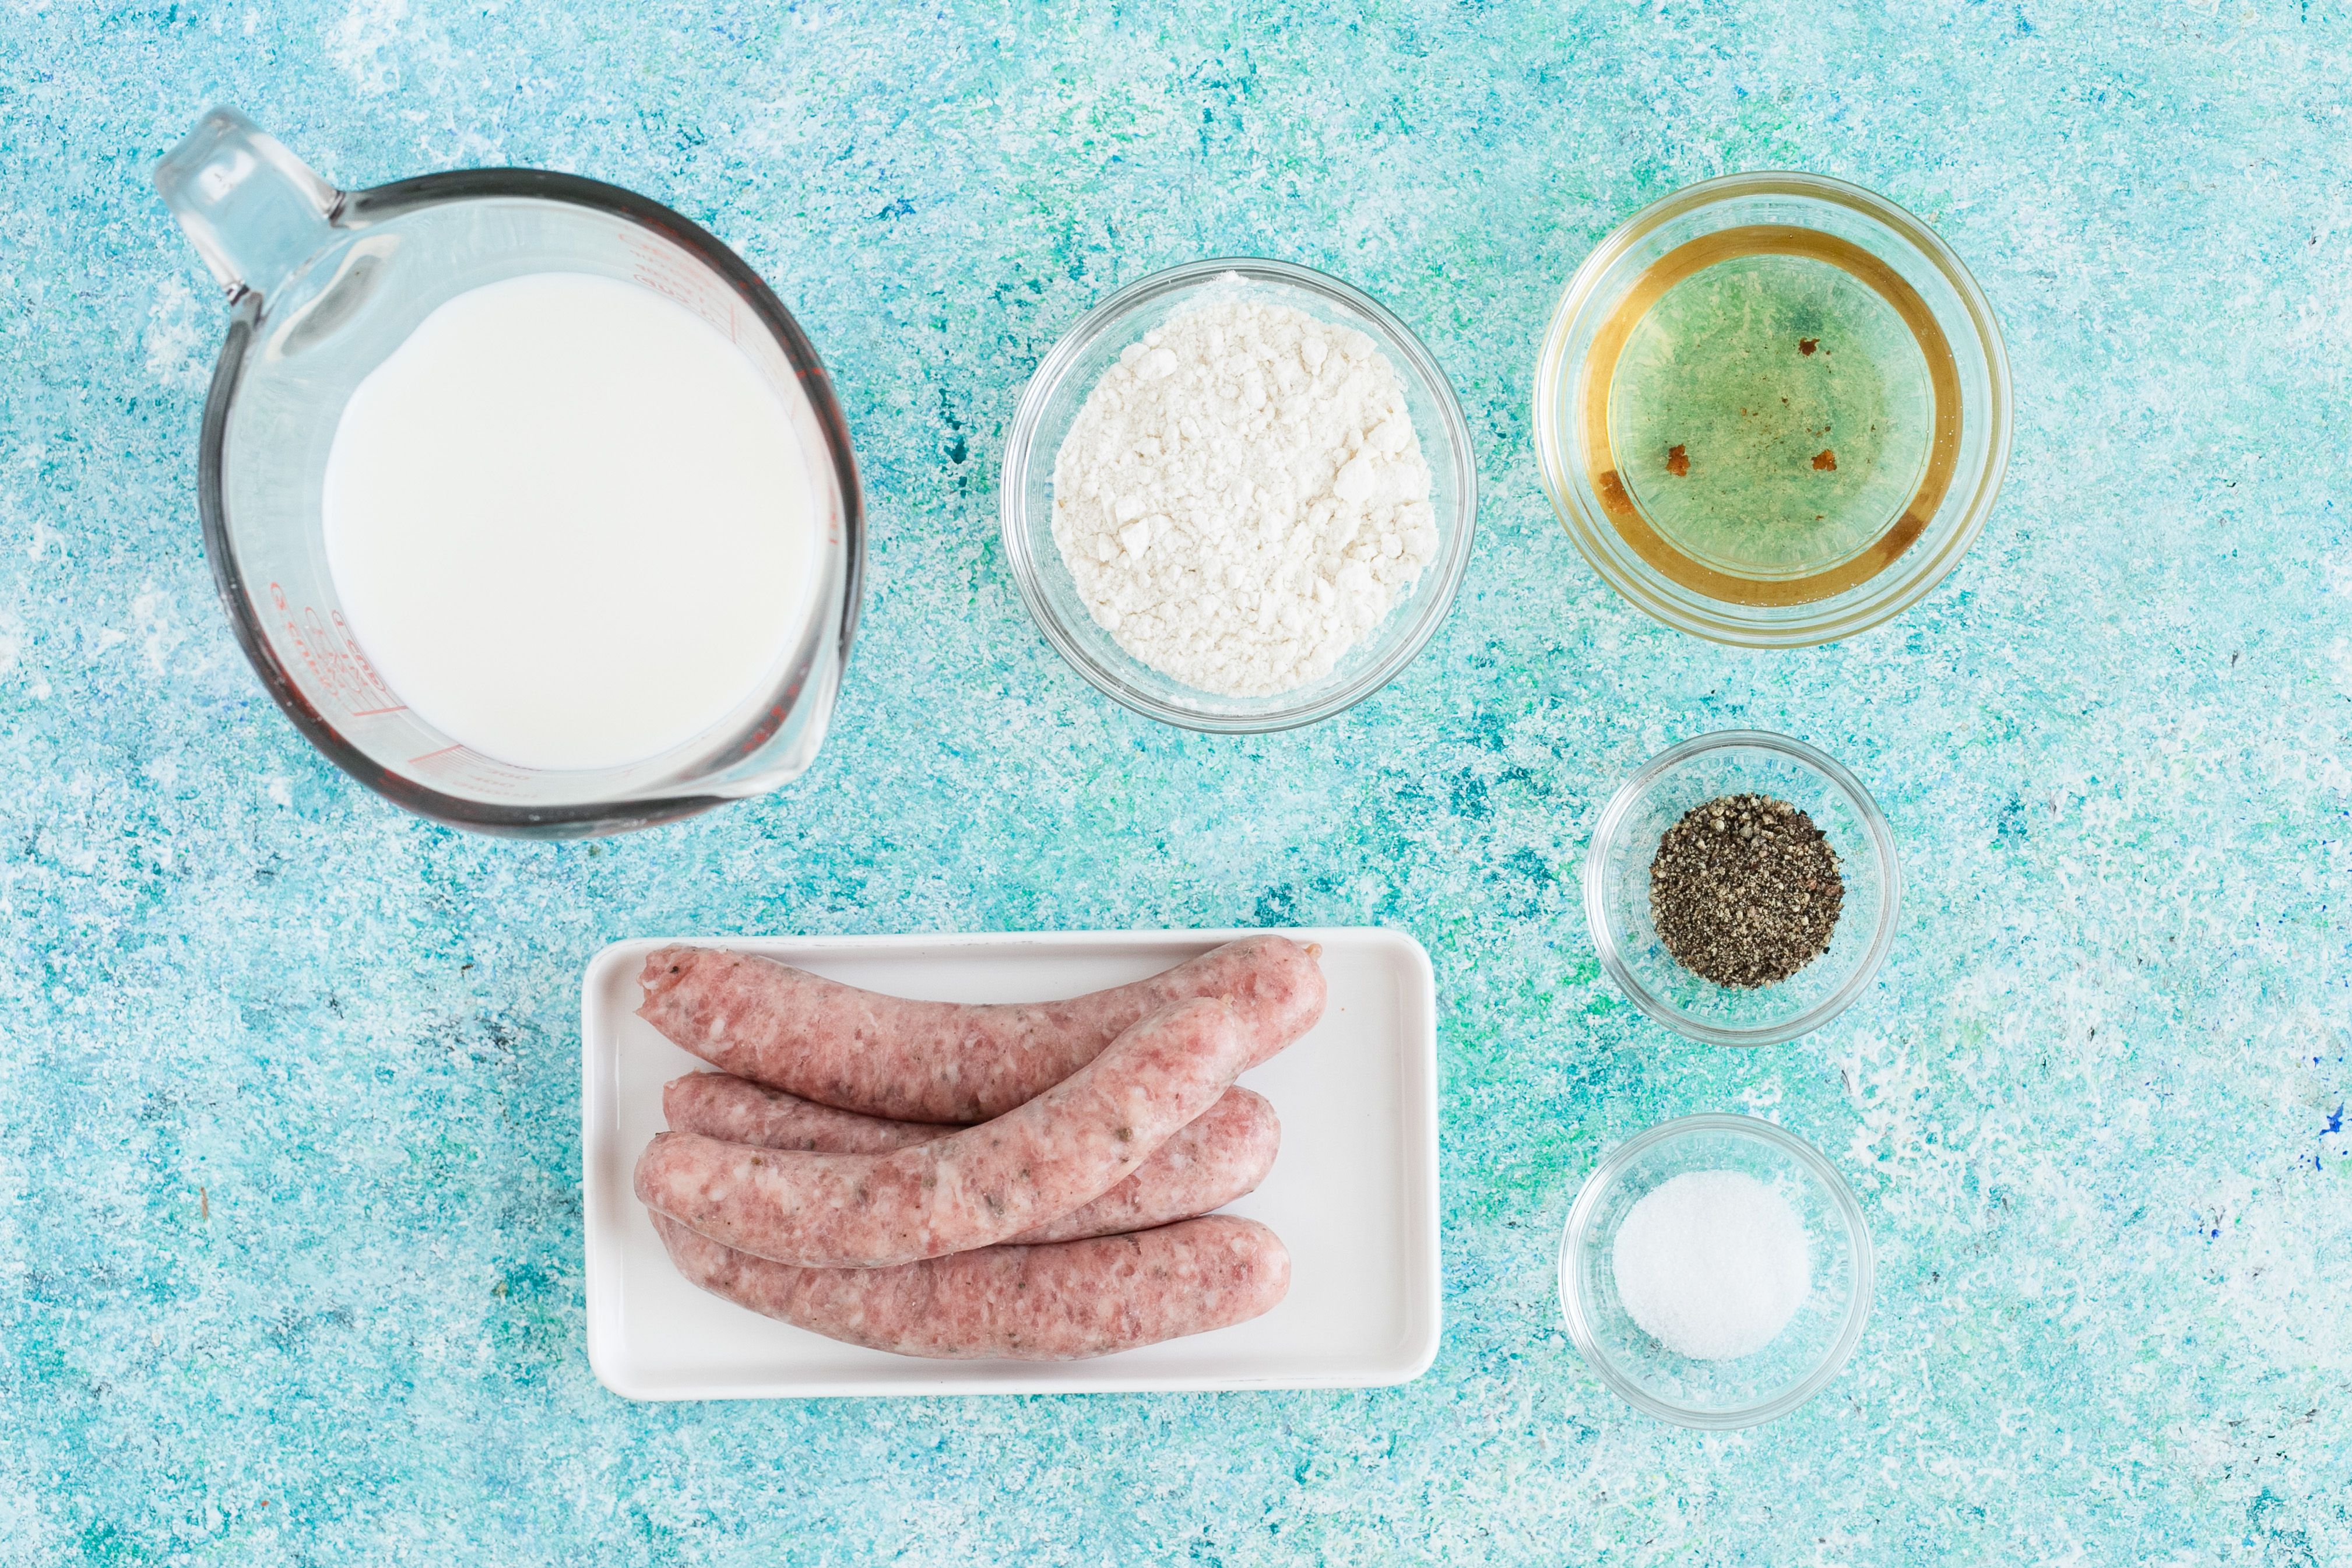 Ingredients for sawmill gravy